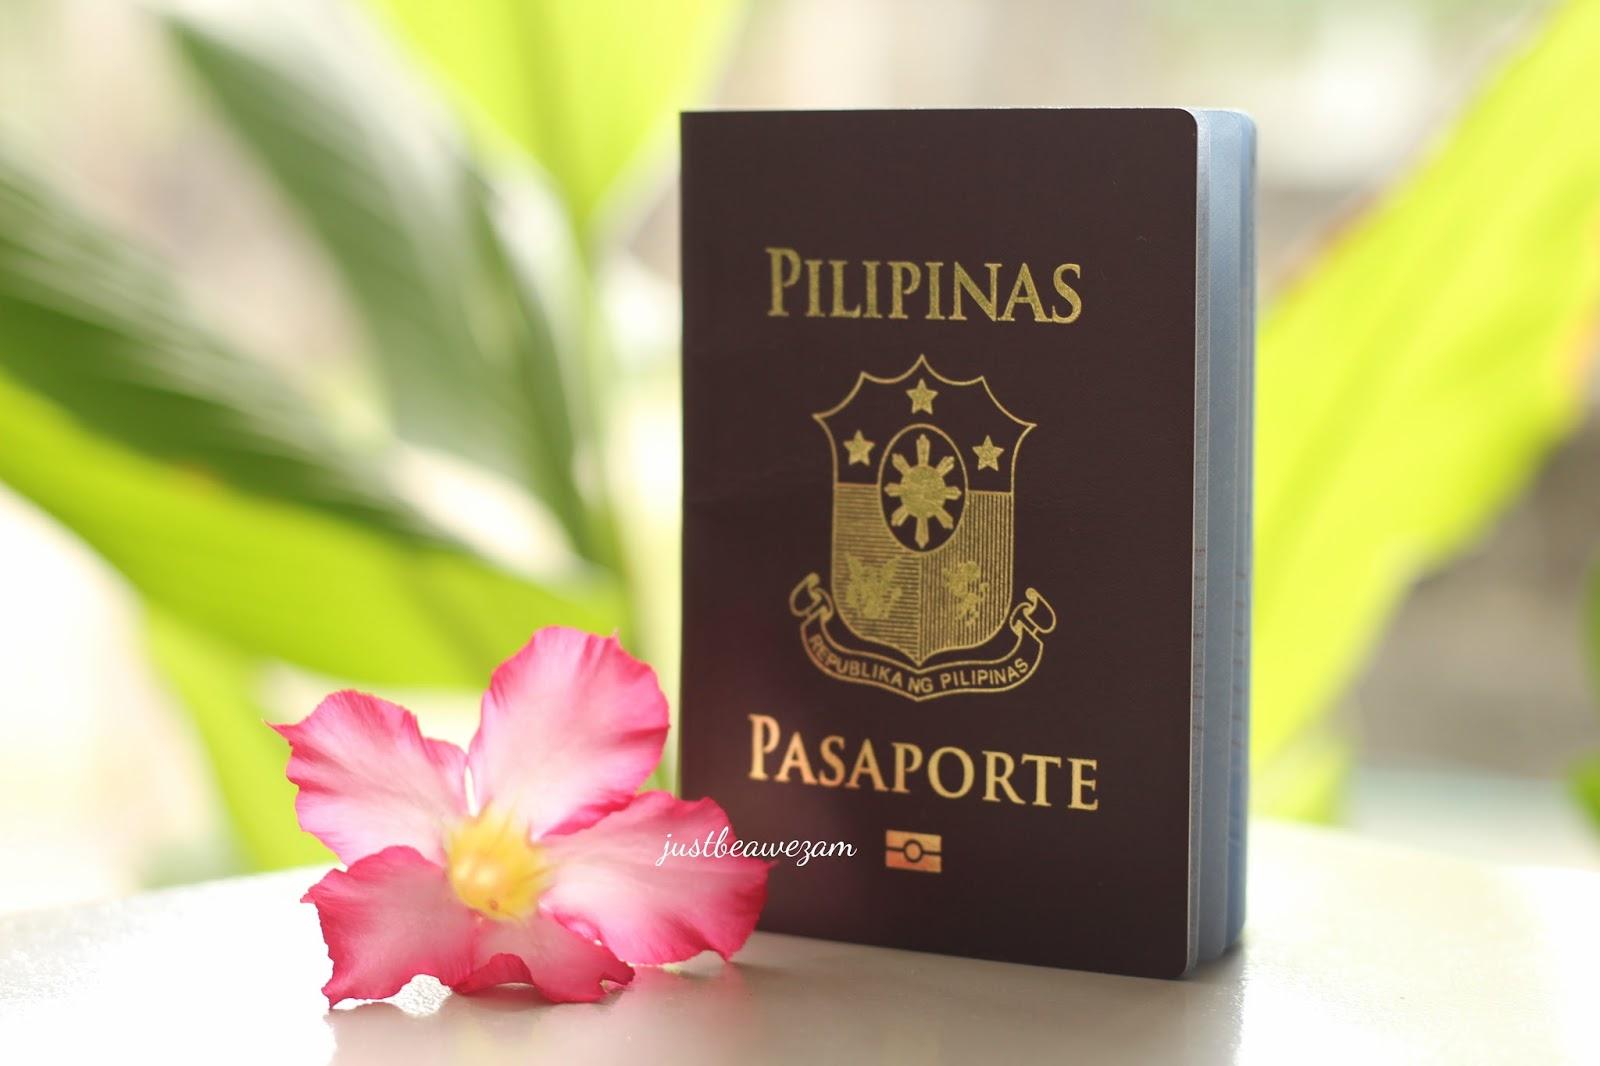 Got my Passport!